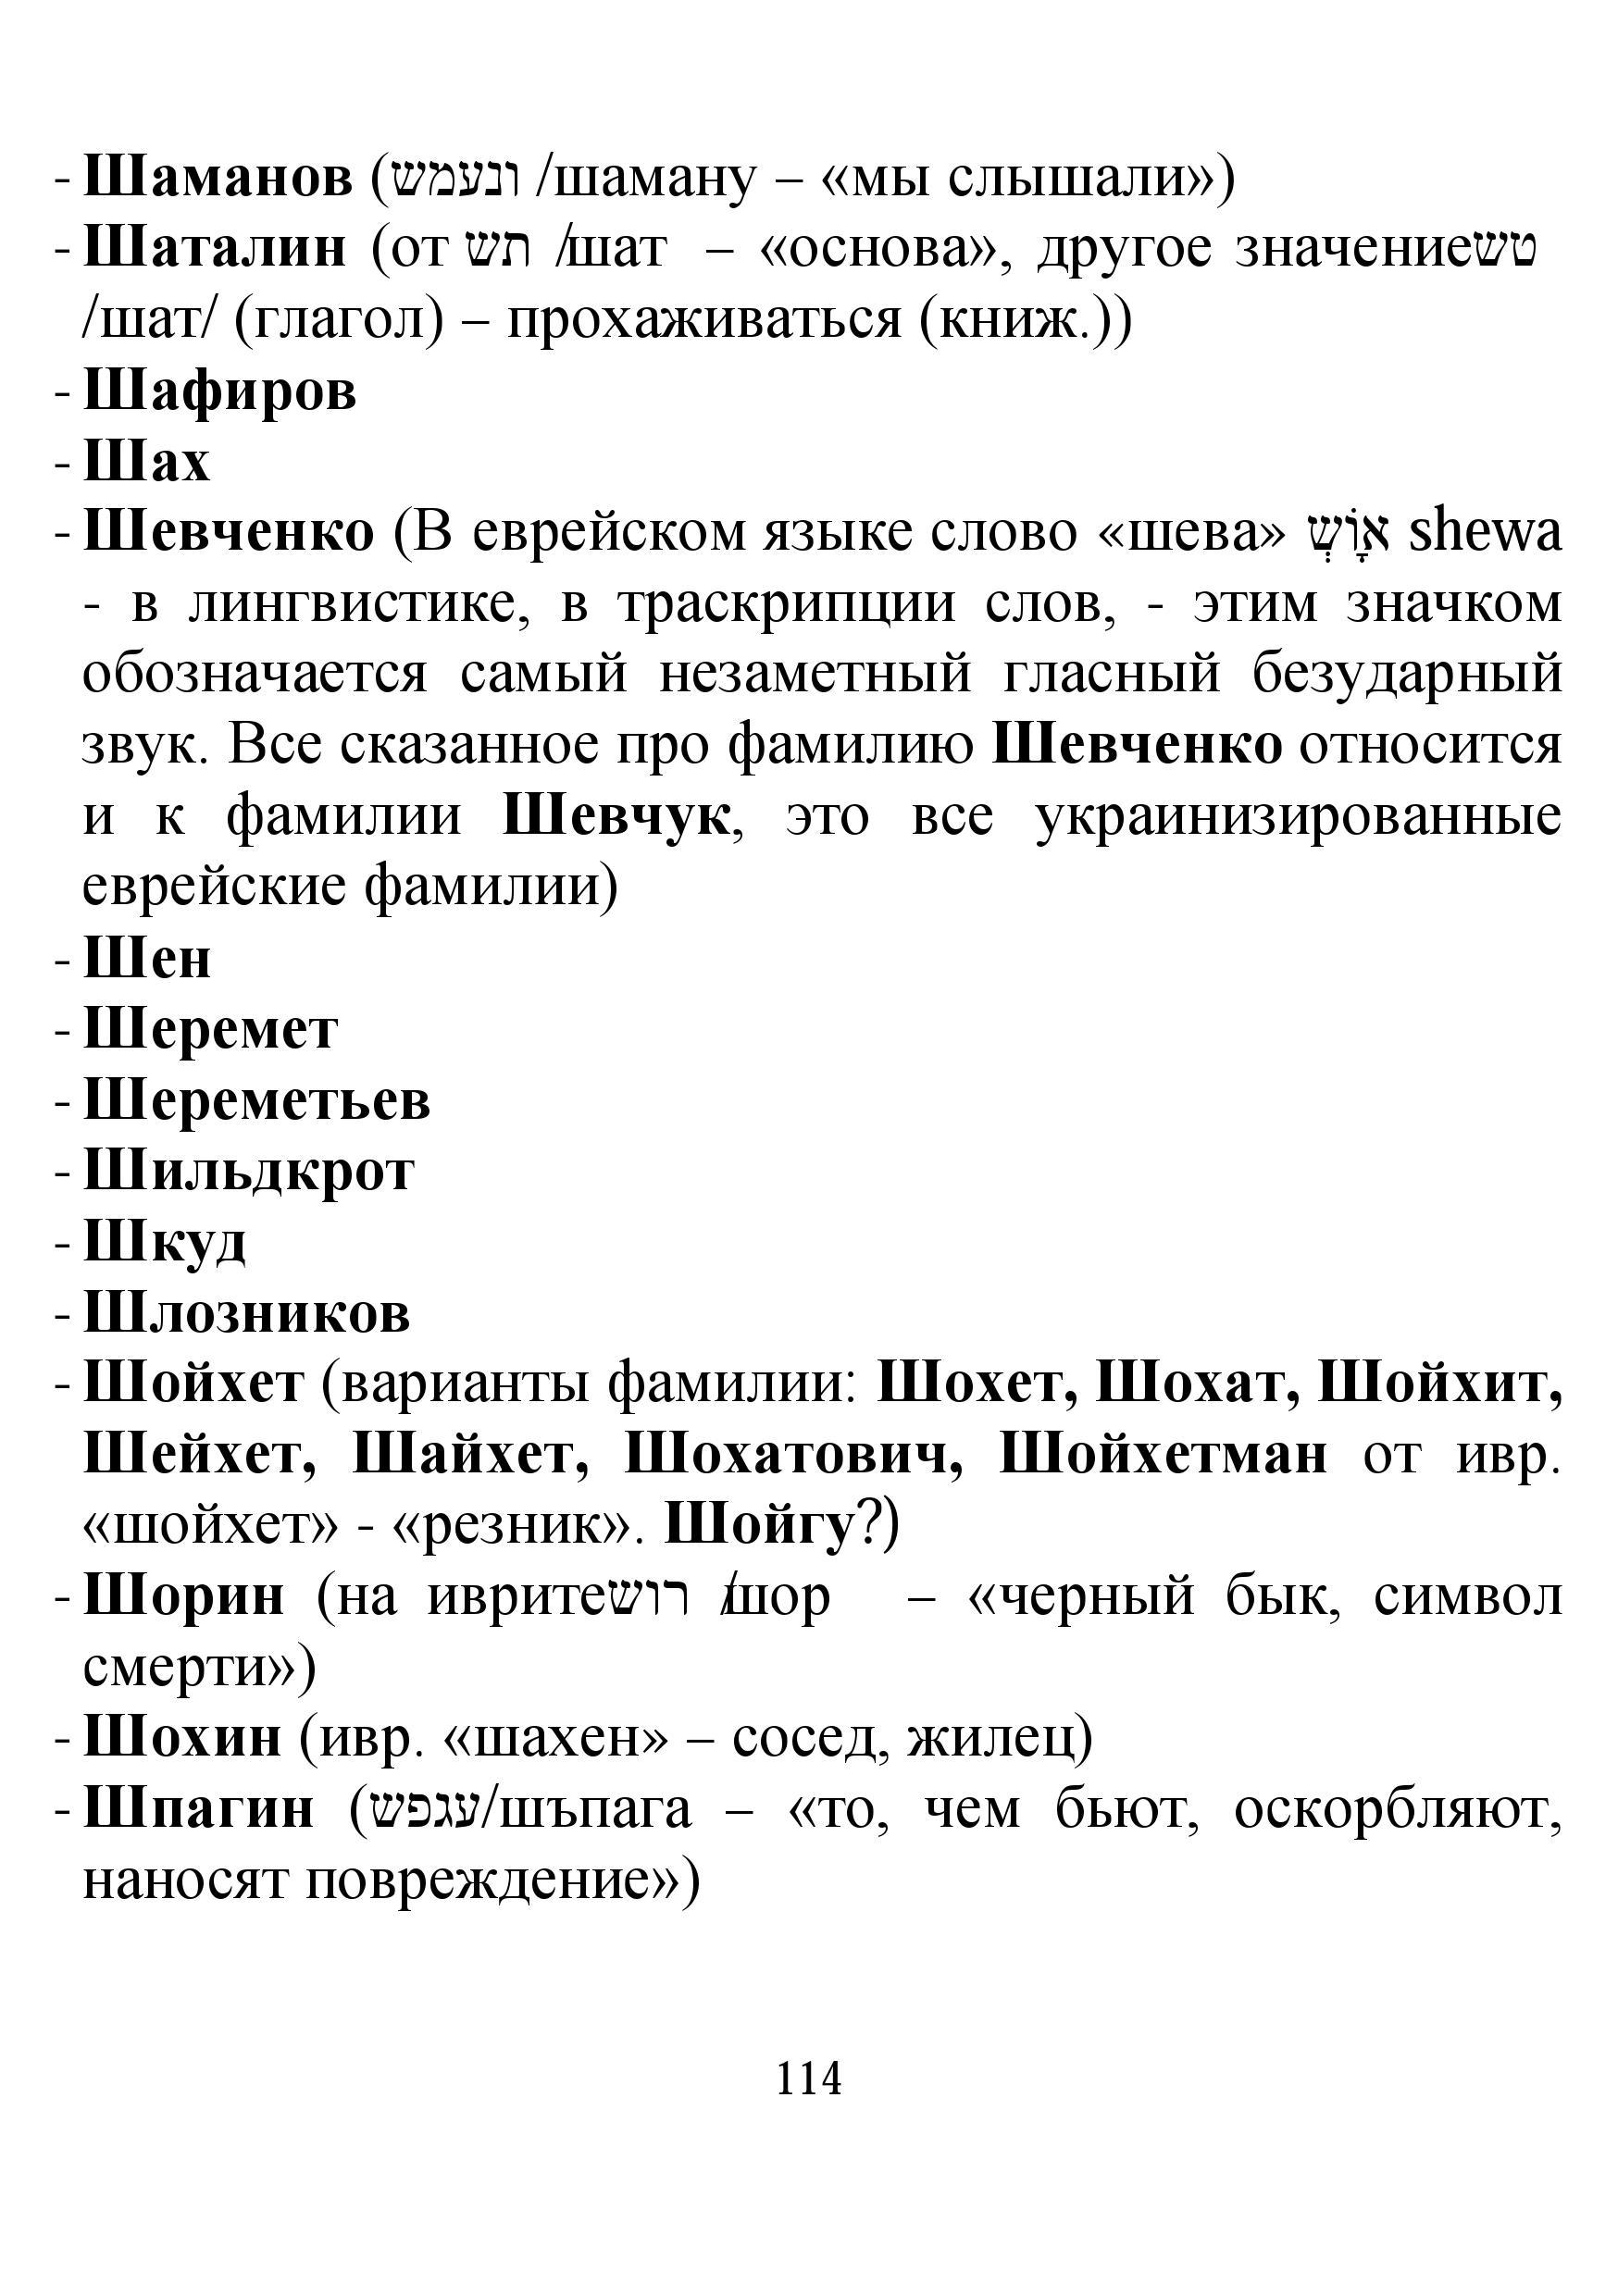 http://s0.uploads.ru/wKsW3.jpg